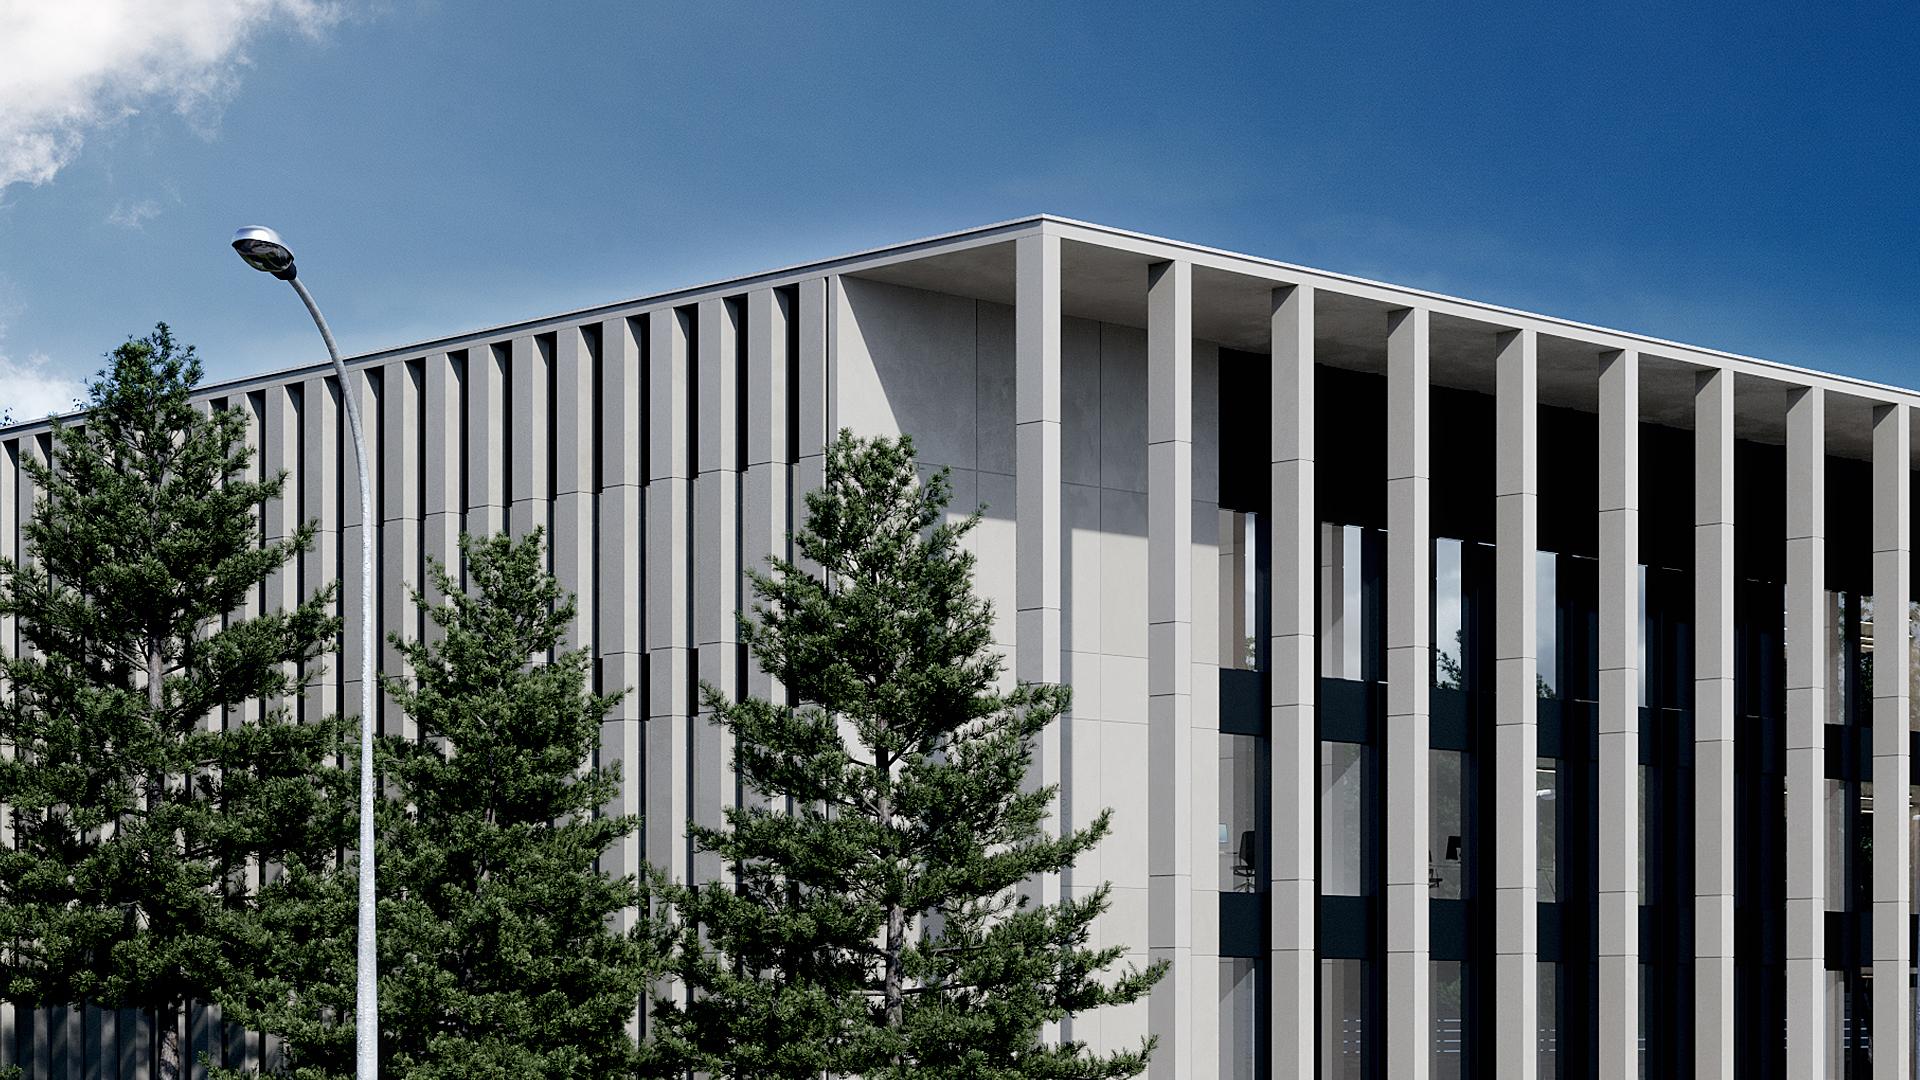 Regional Courthouse